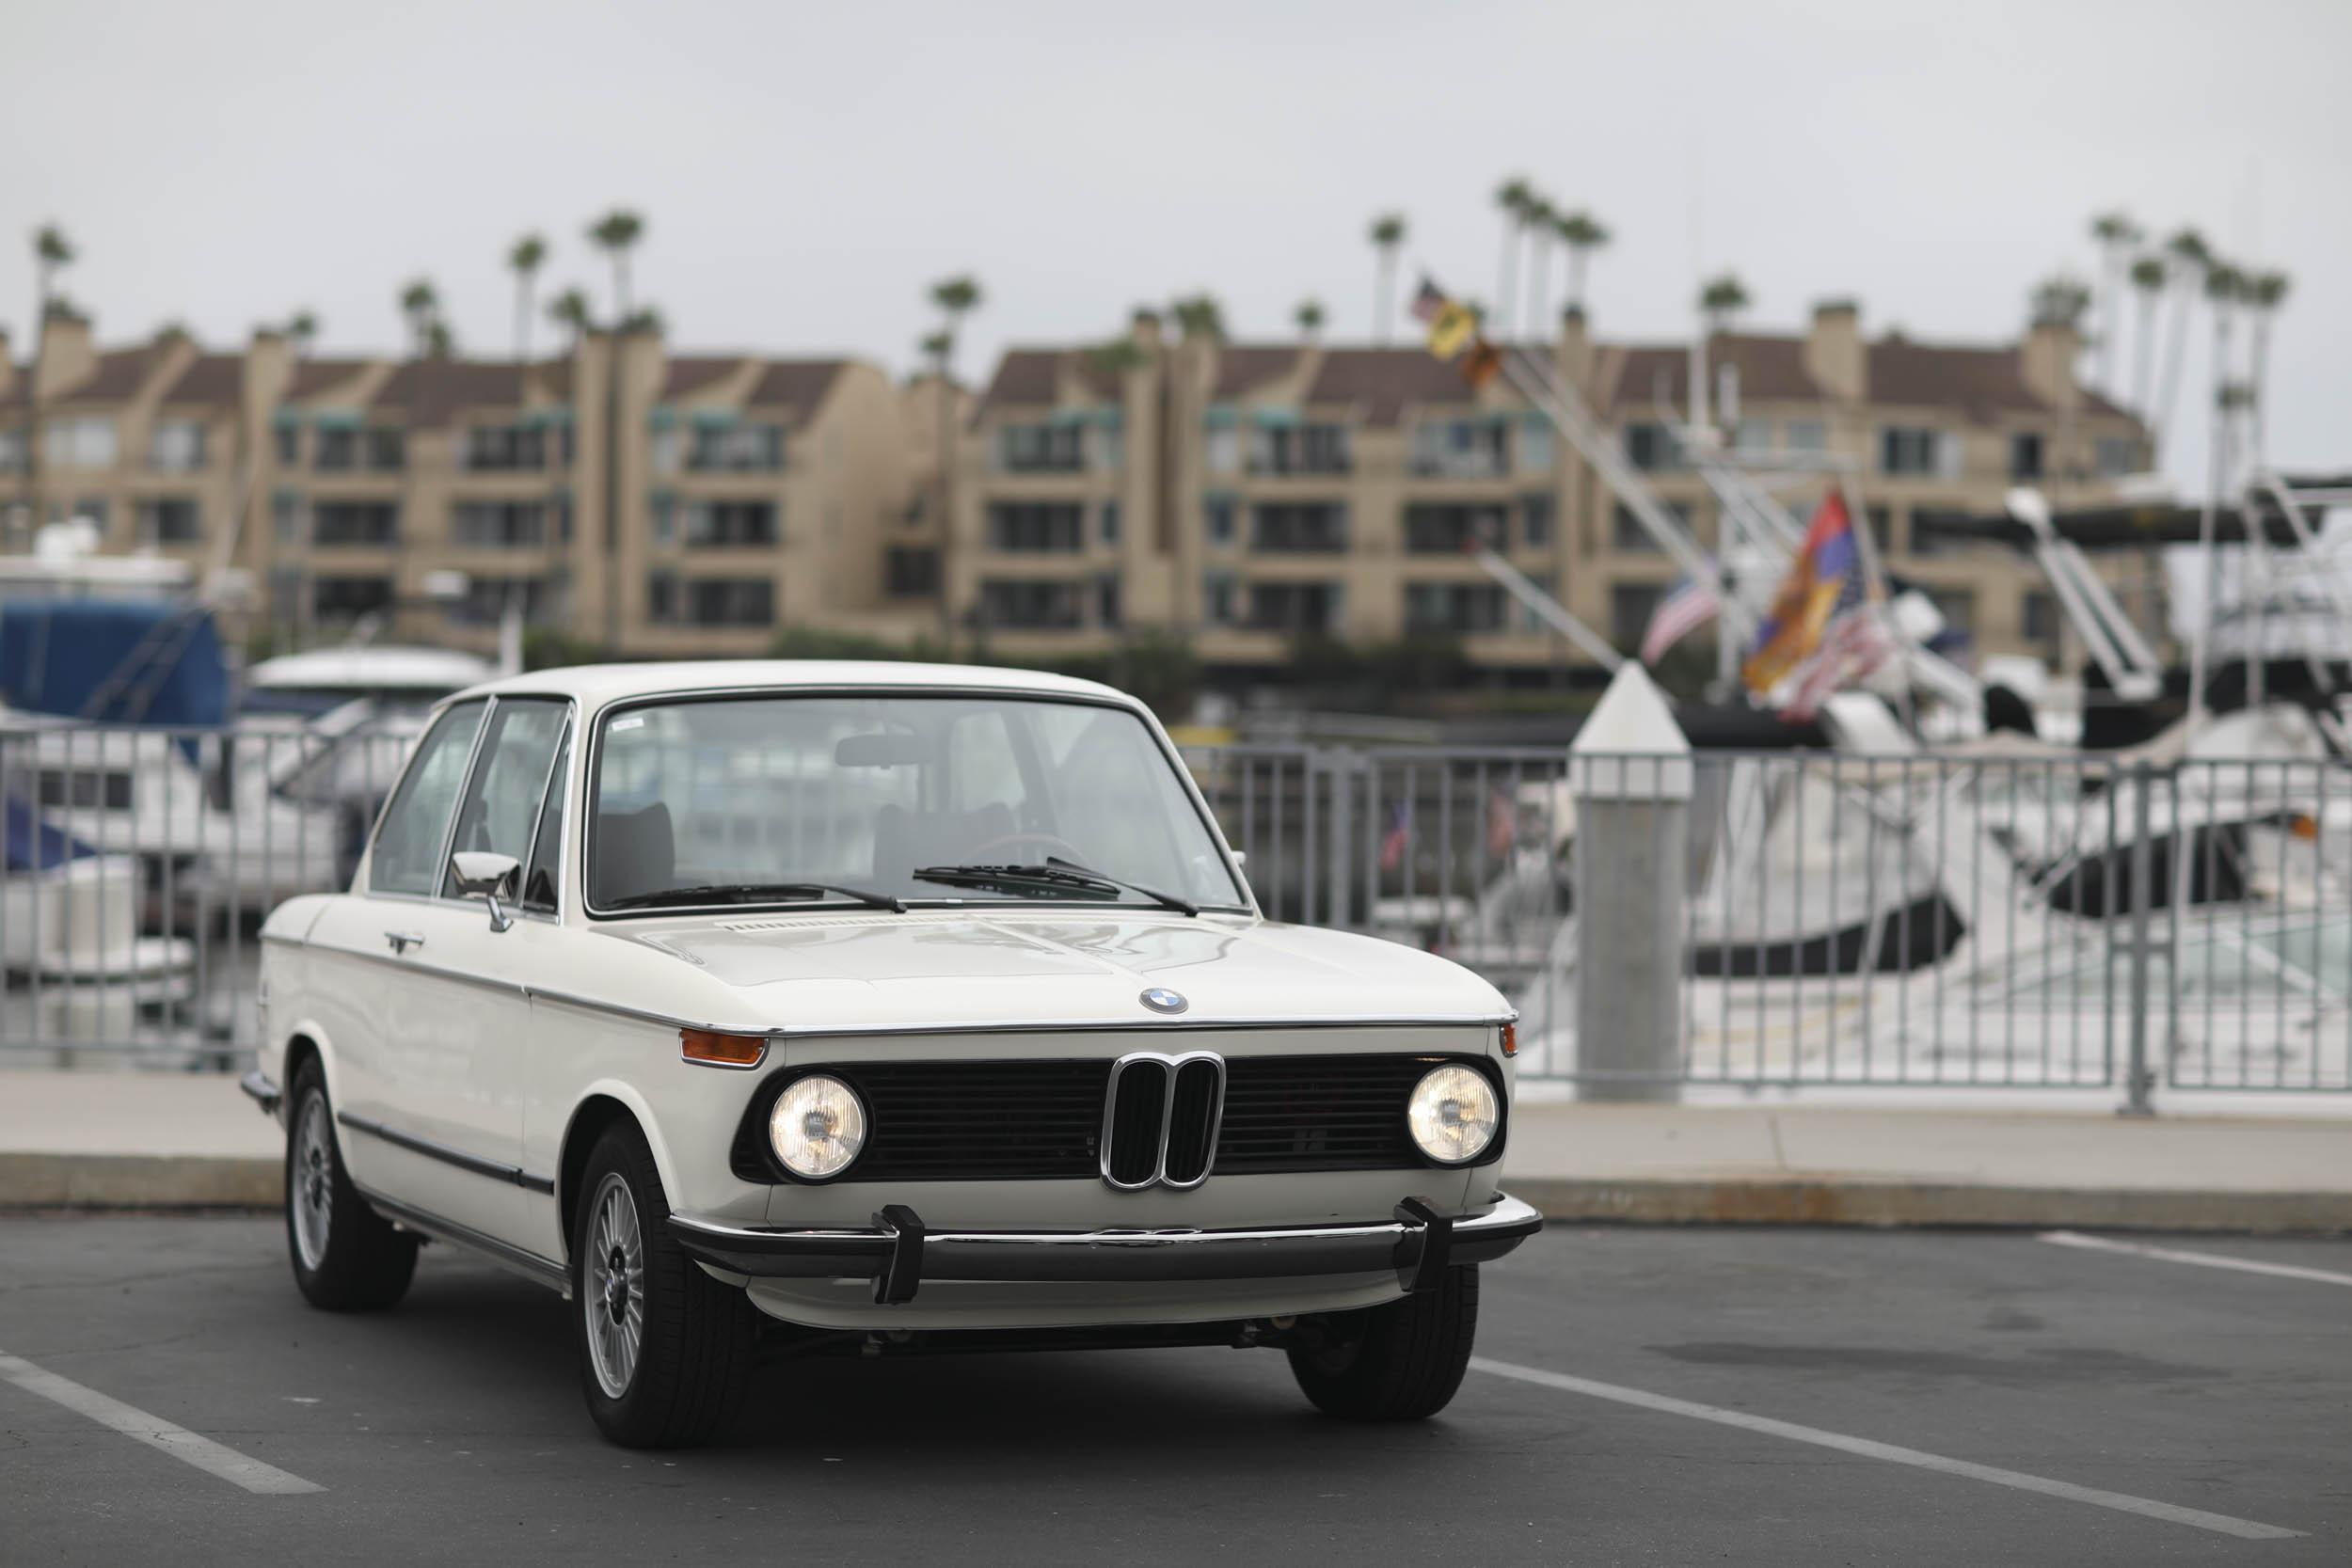 1975 BMW 2002 headlights on